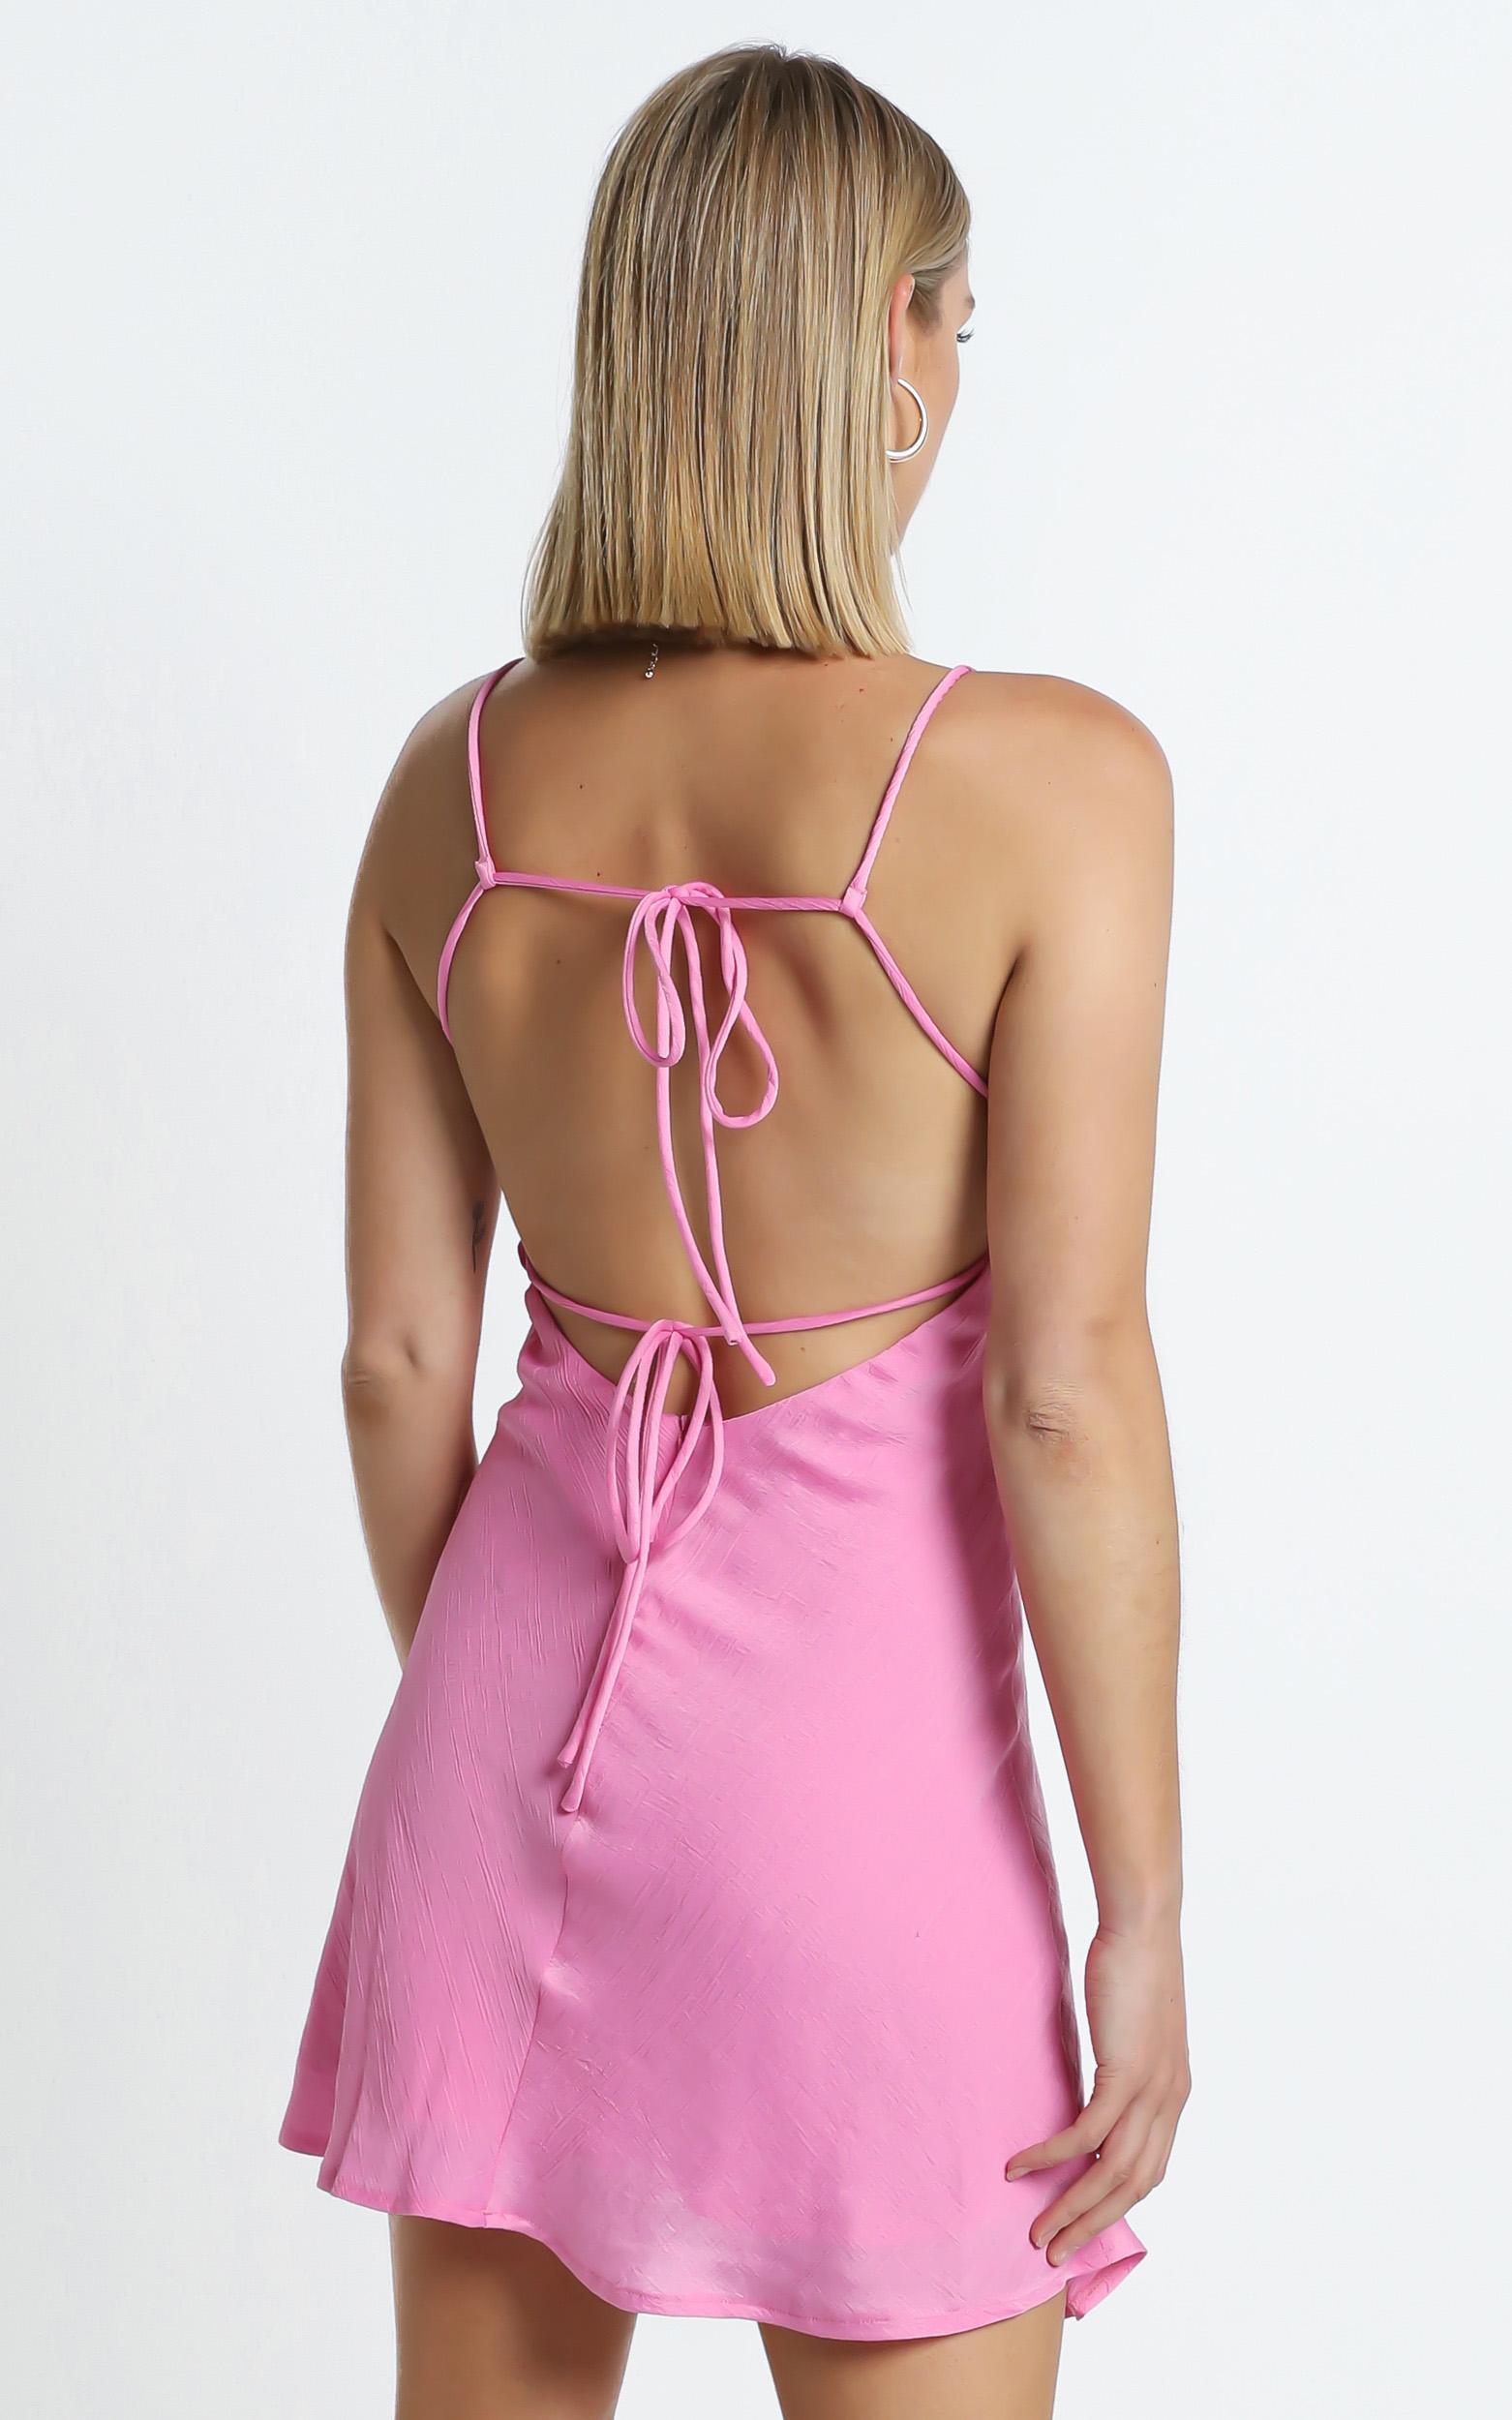 Tilbury Dress in Pink - 6 (XS), Pink, hi-res image number null